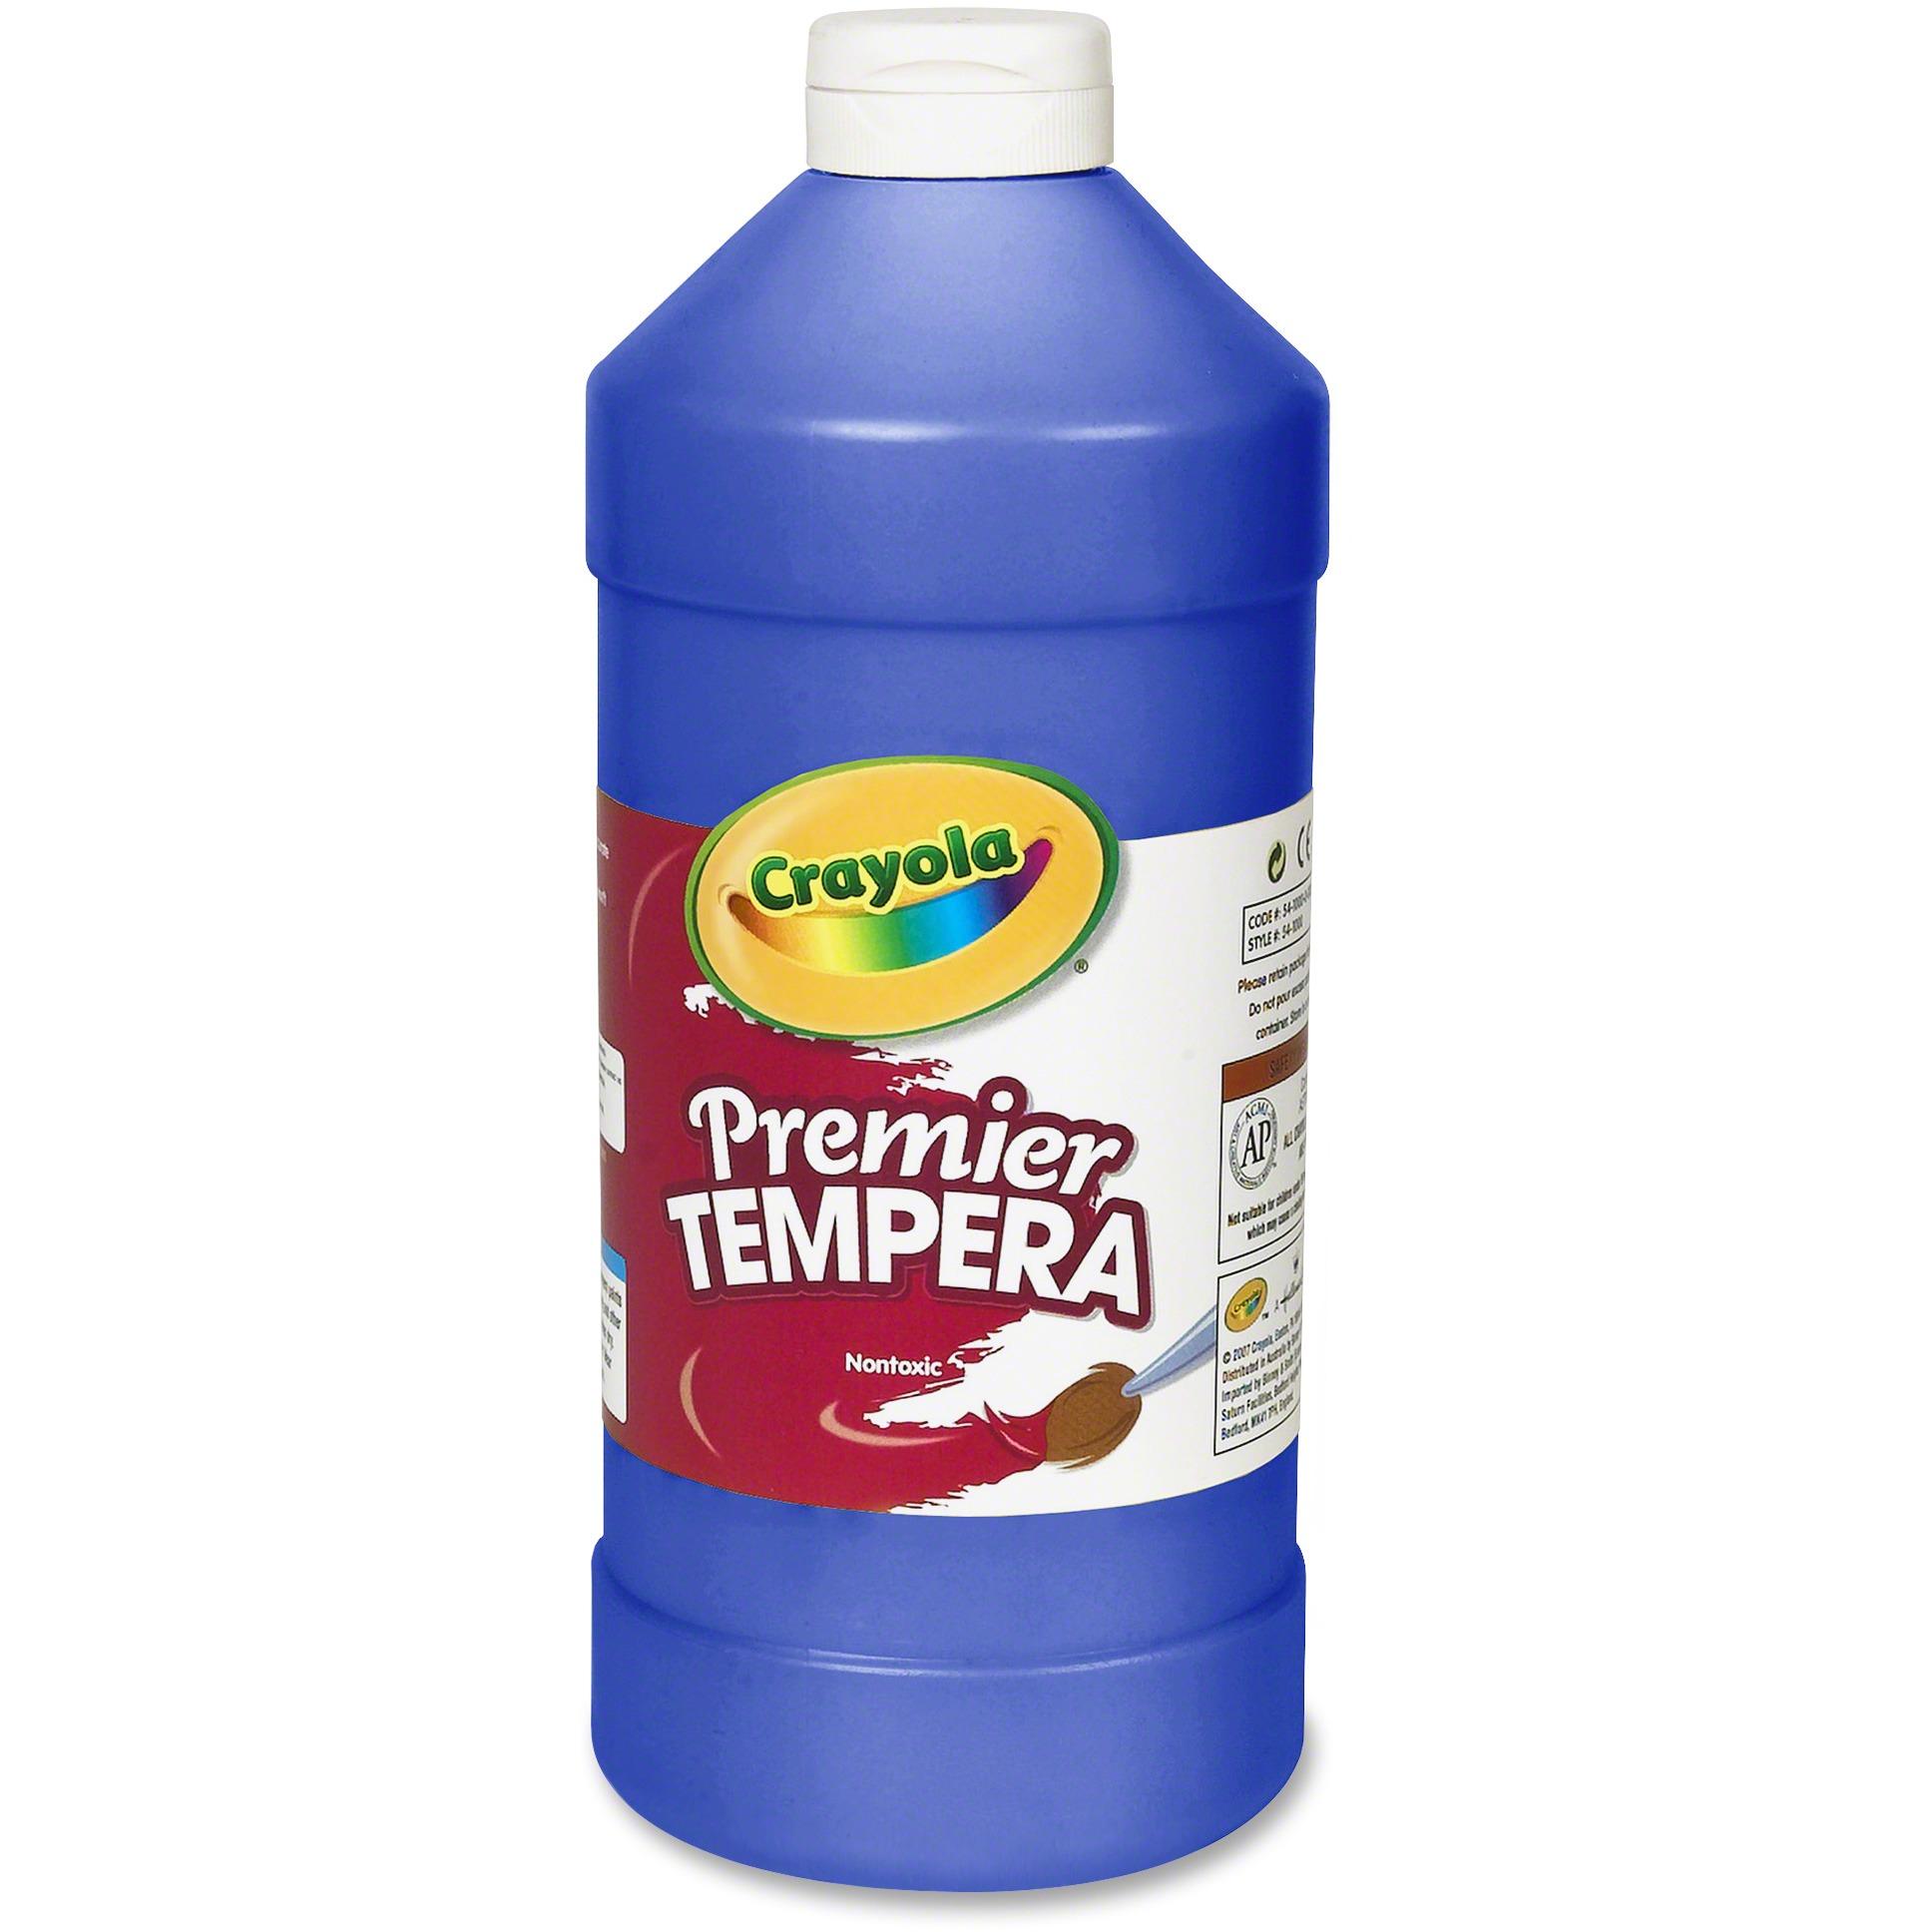 Crayola Premier Tempera Paint, Blue, 32 Oz